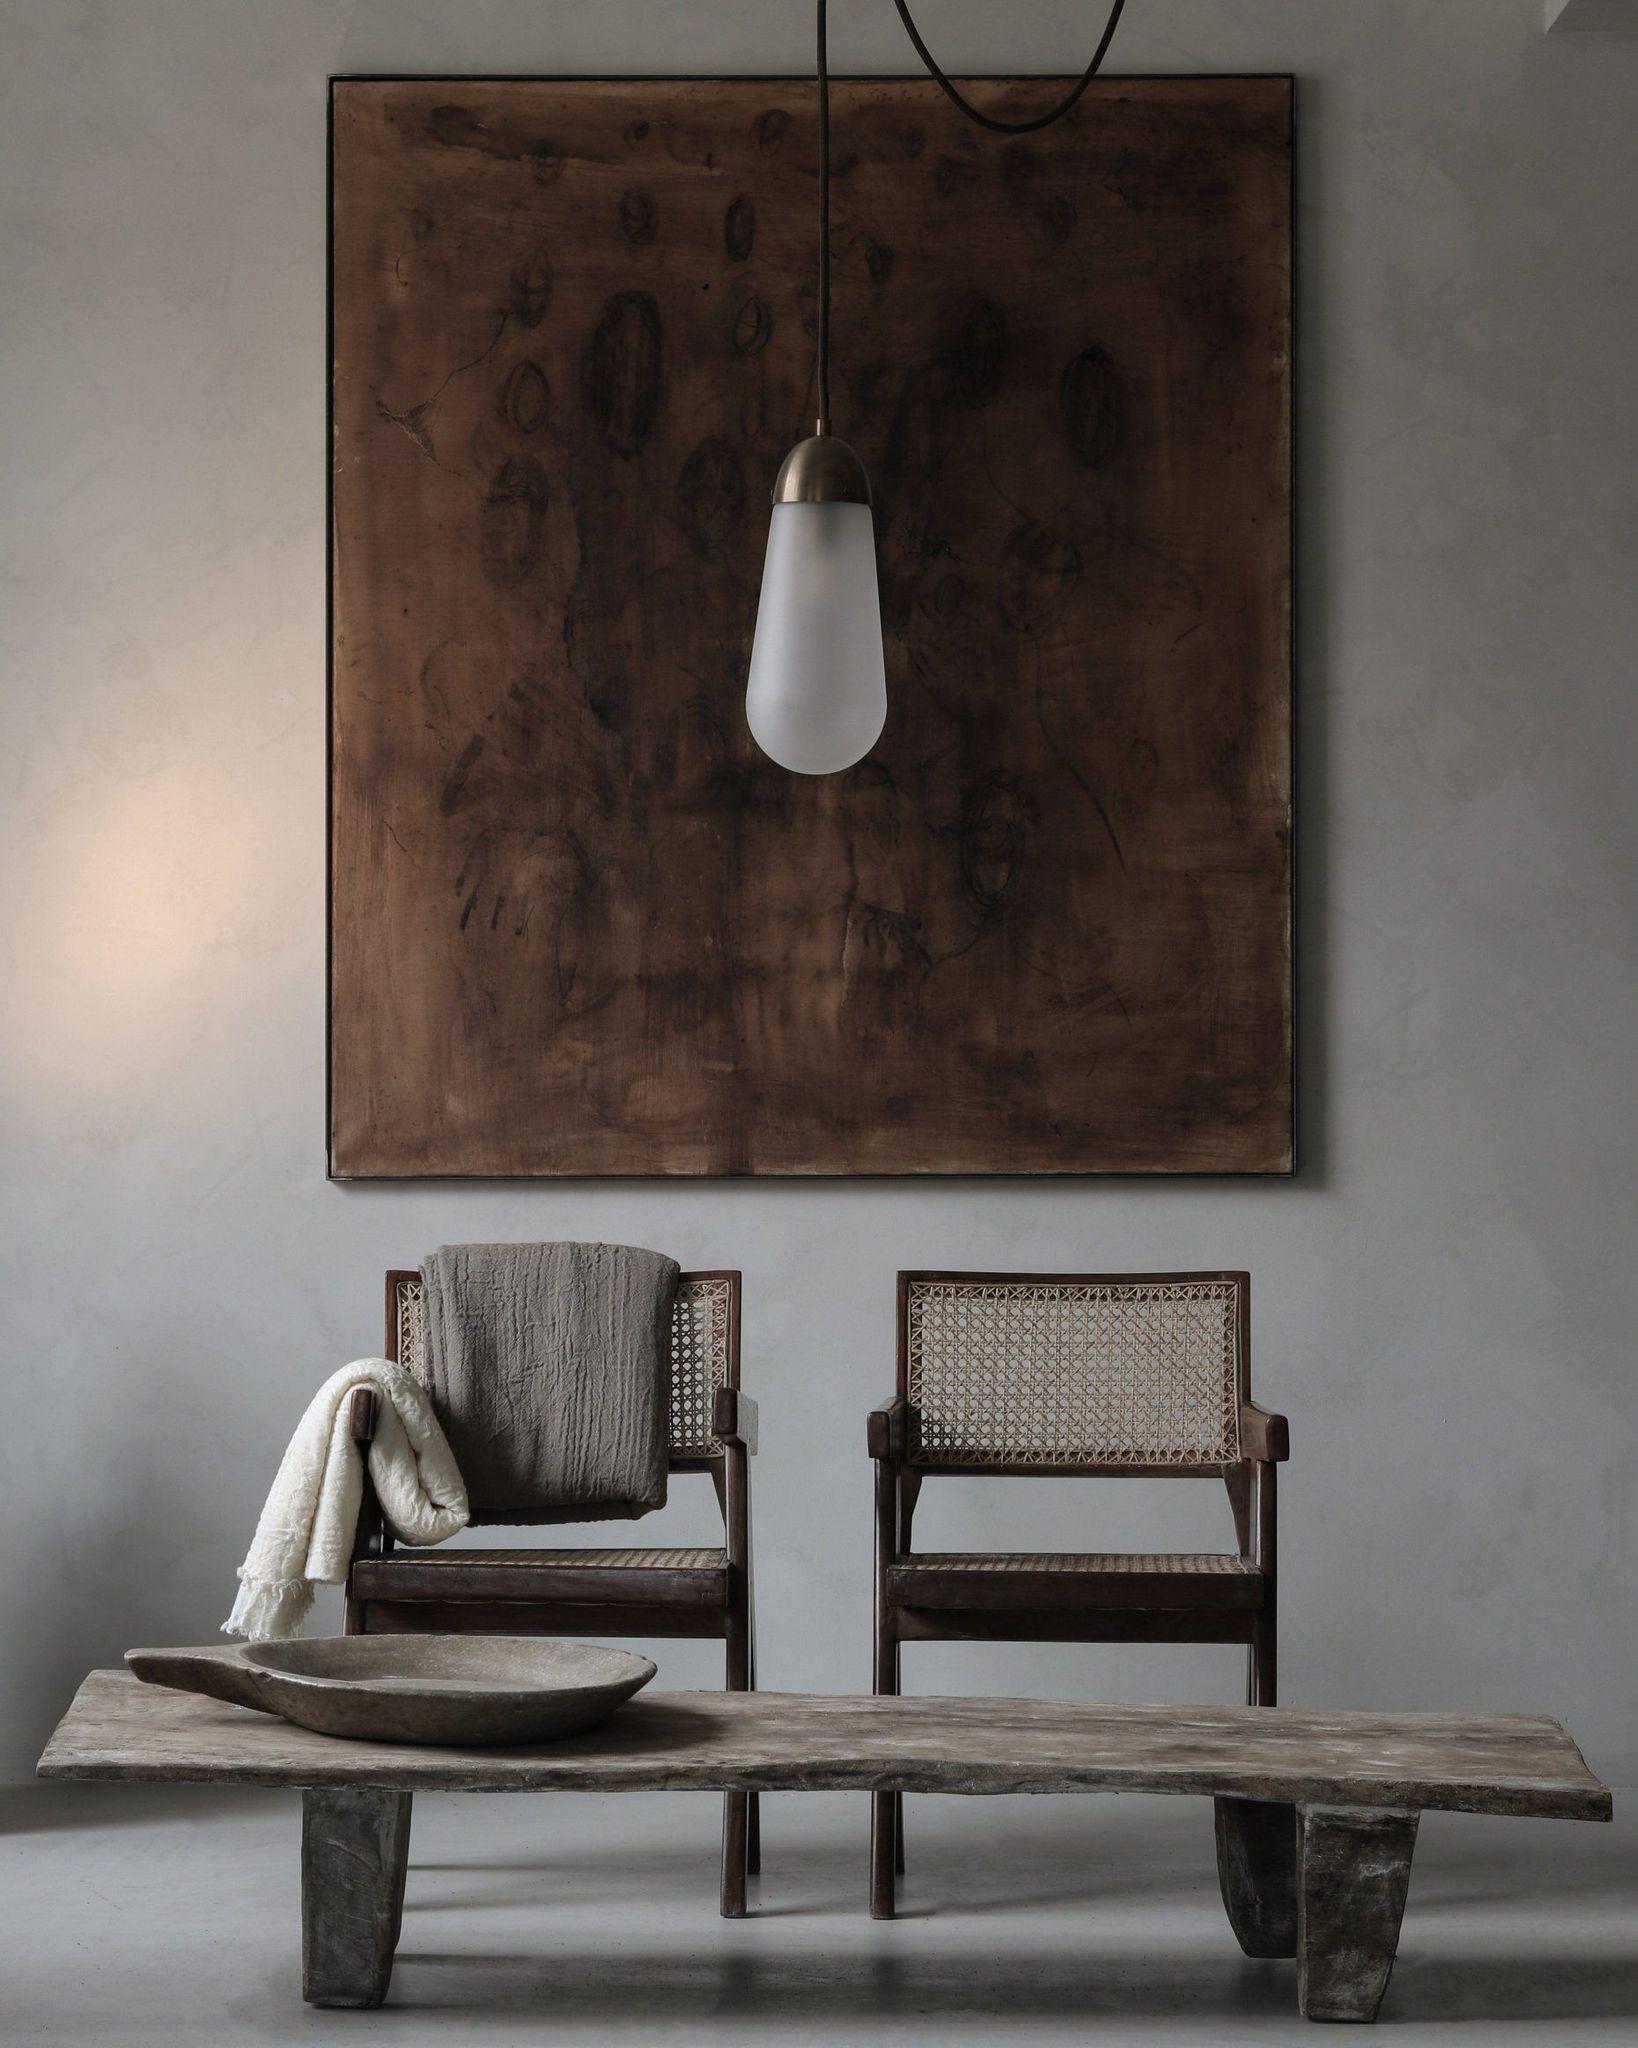 Каменный стол. Интерьер ваби саби